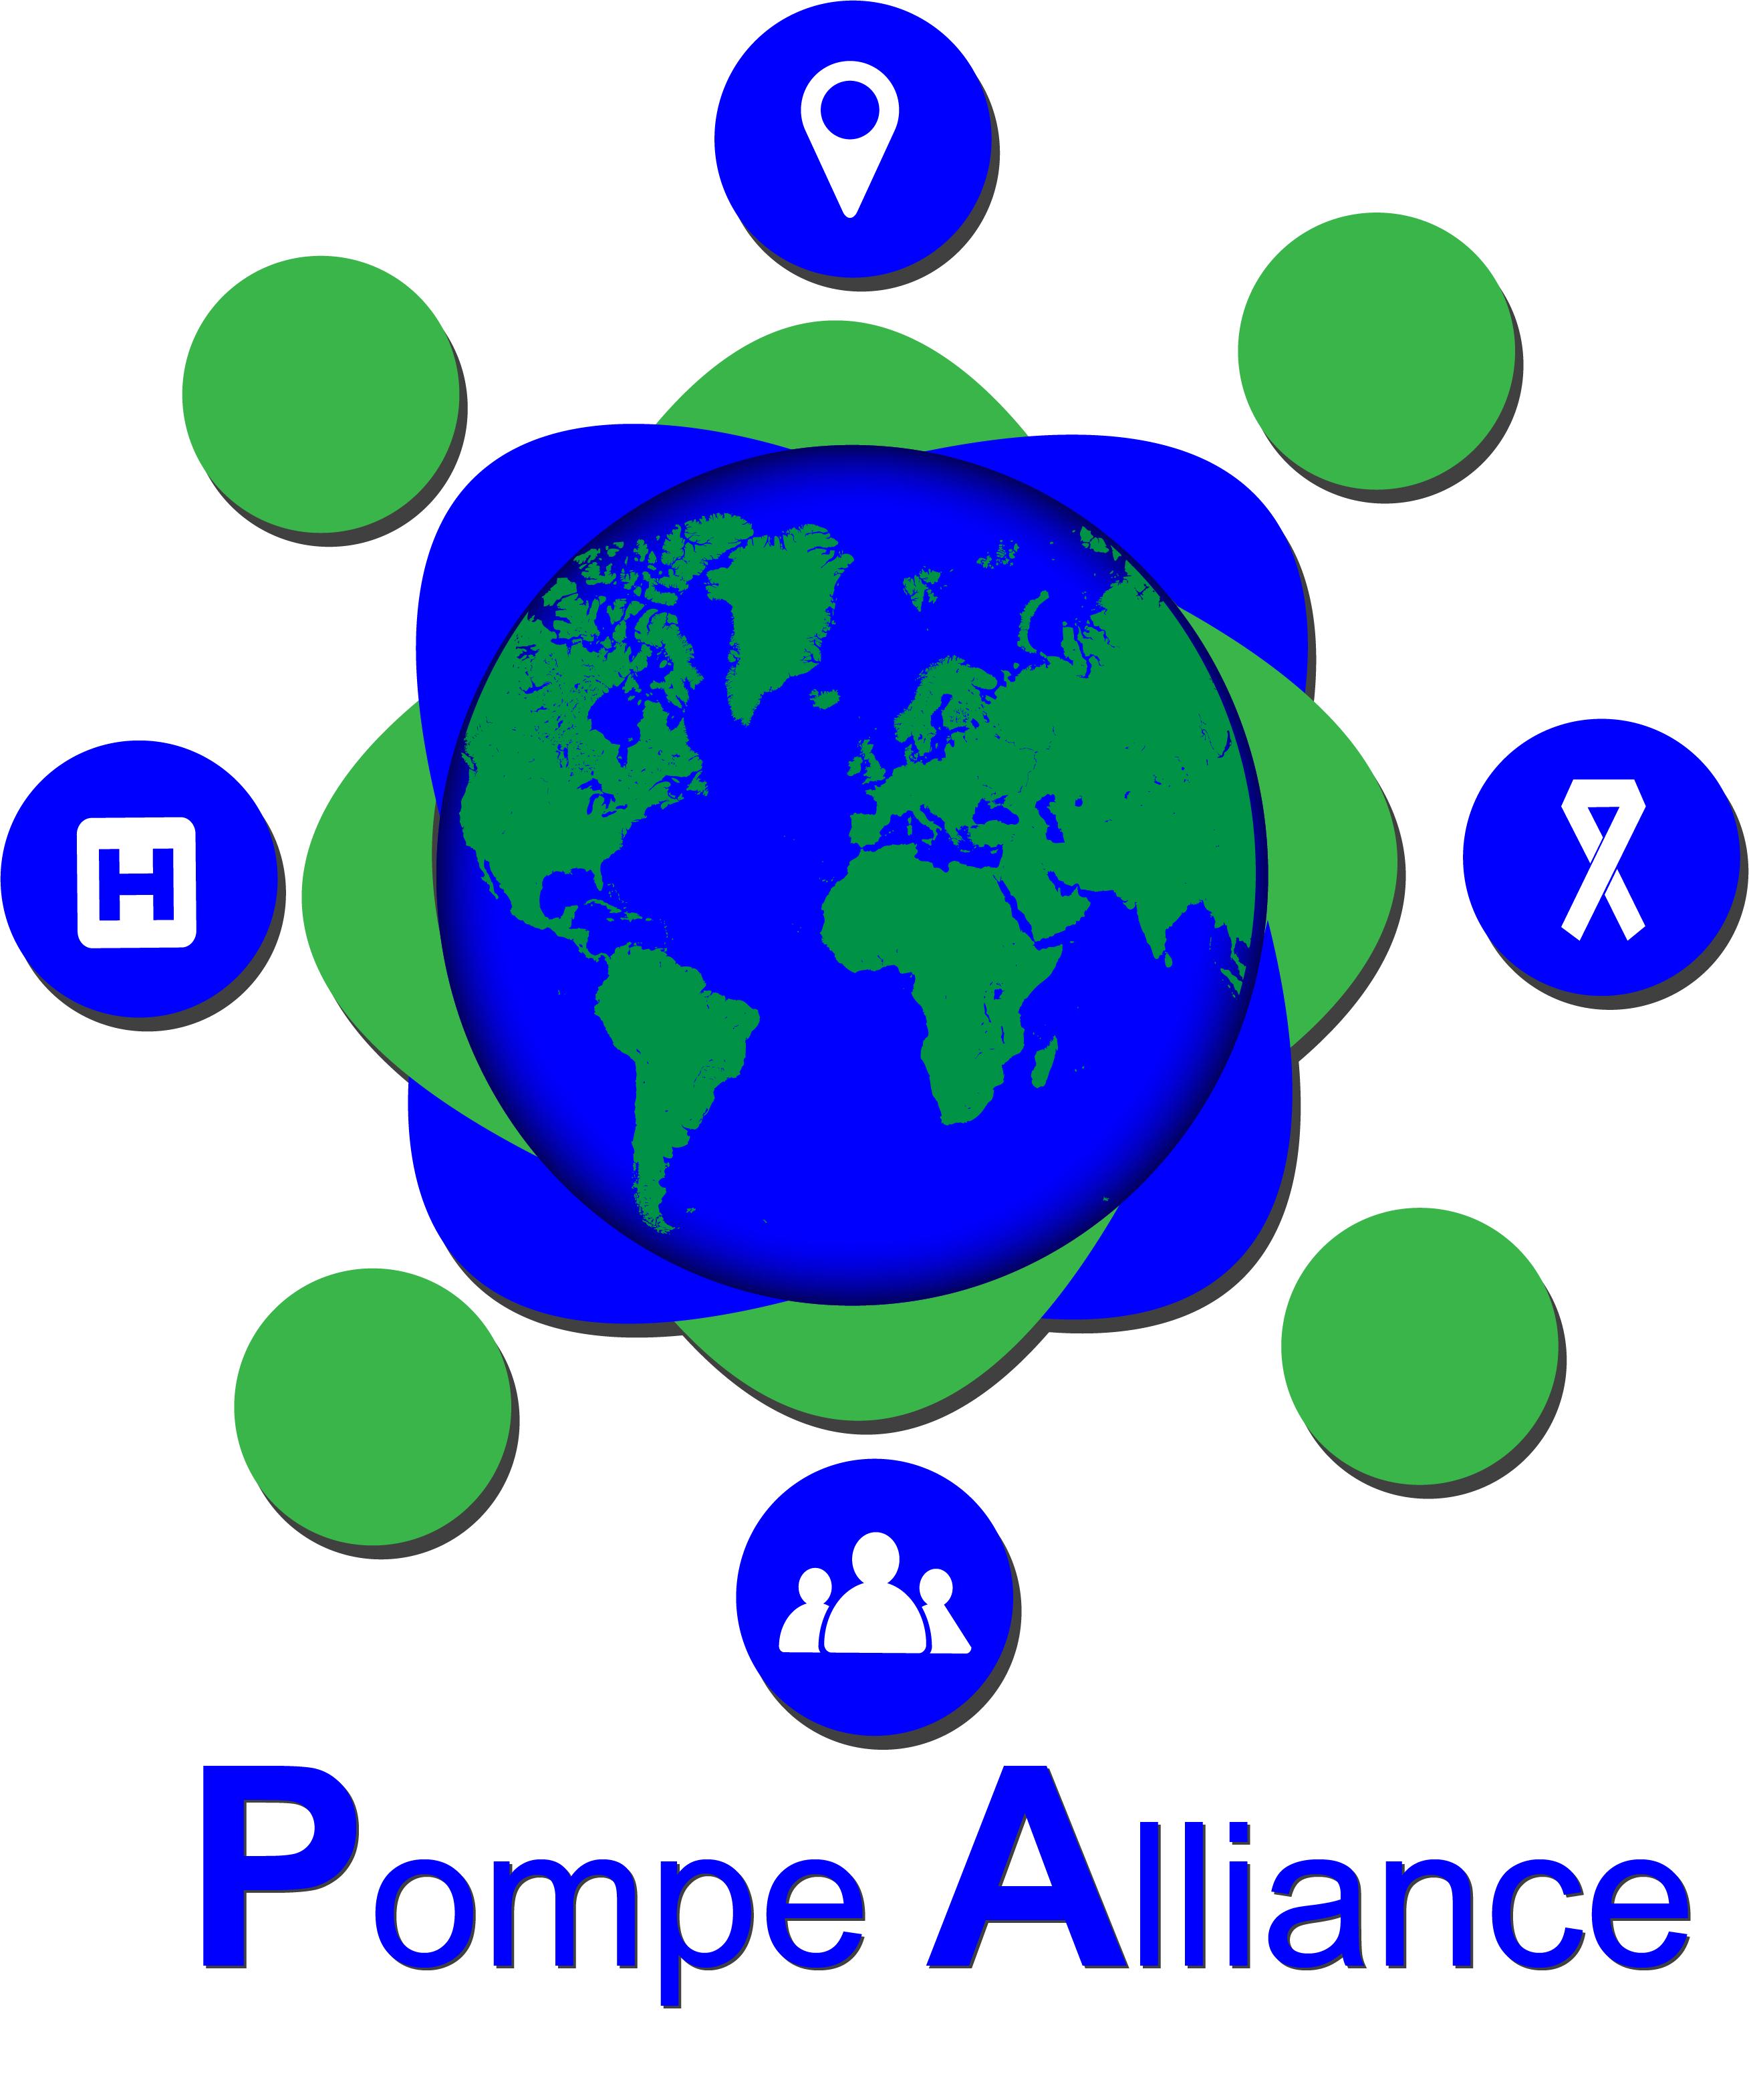 Pompe Alliance